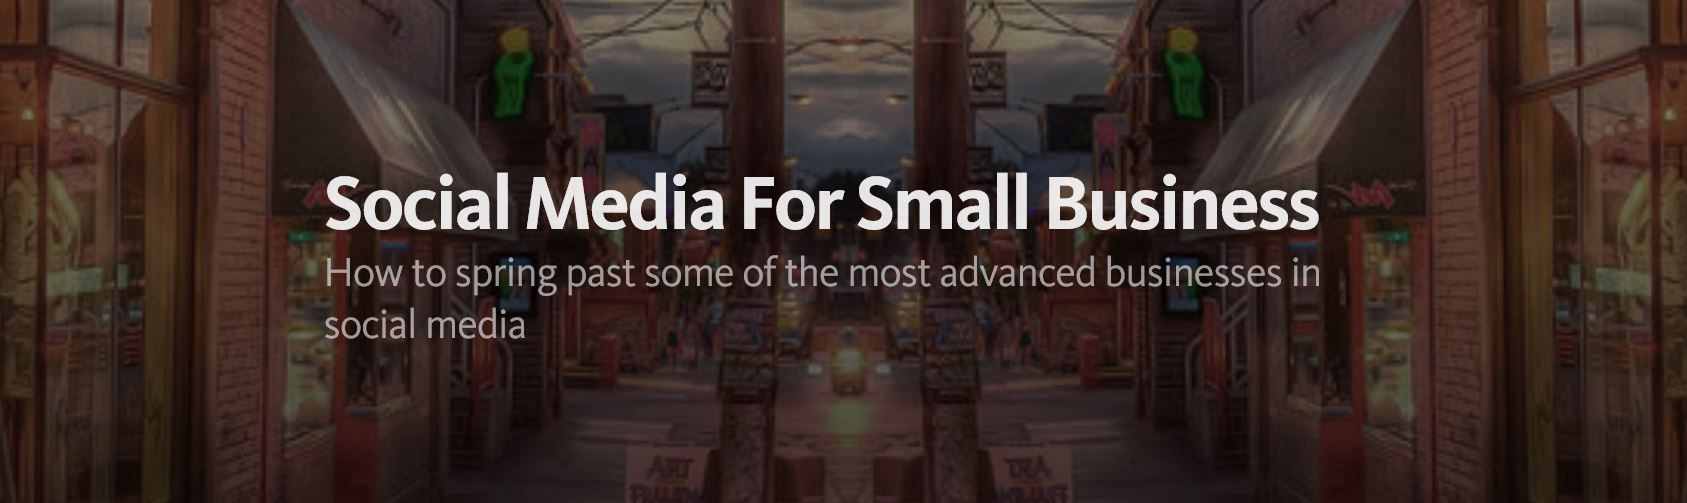 Social Media For Small Business   #SocialMedia #SmallBiz